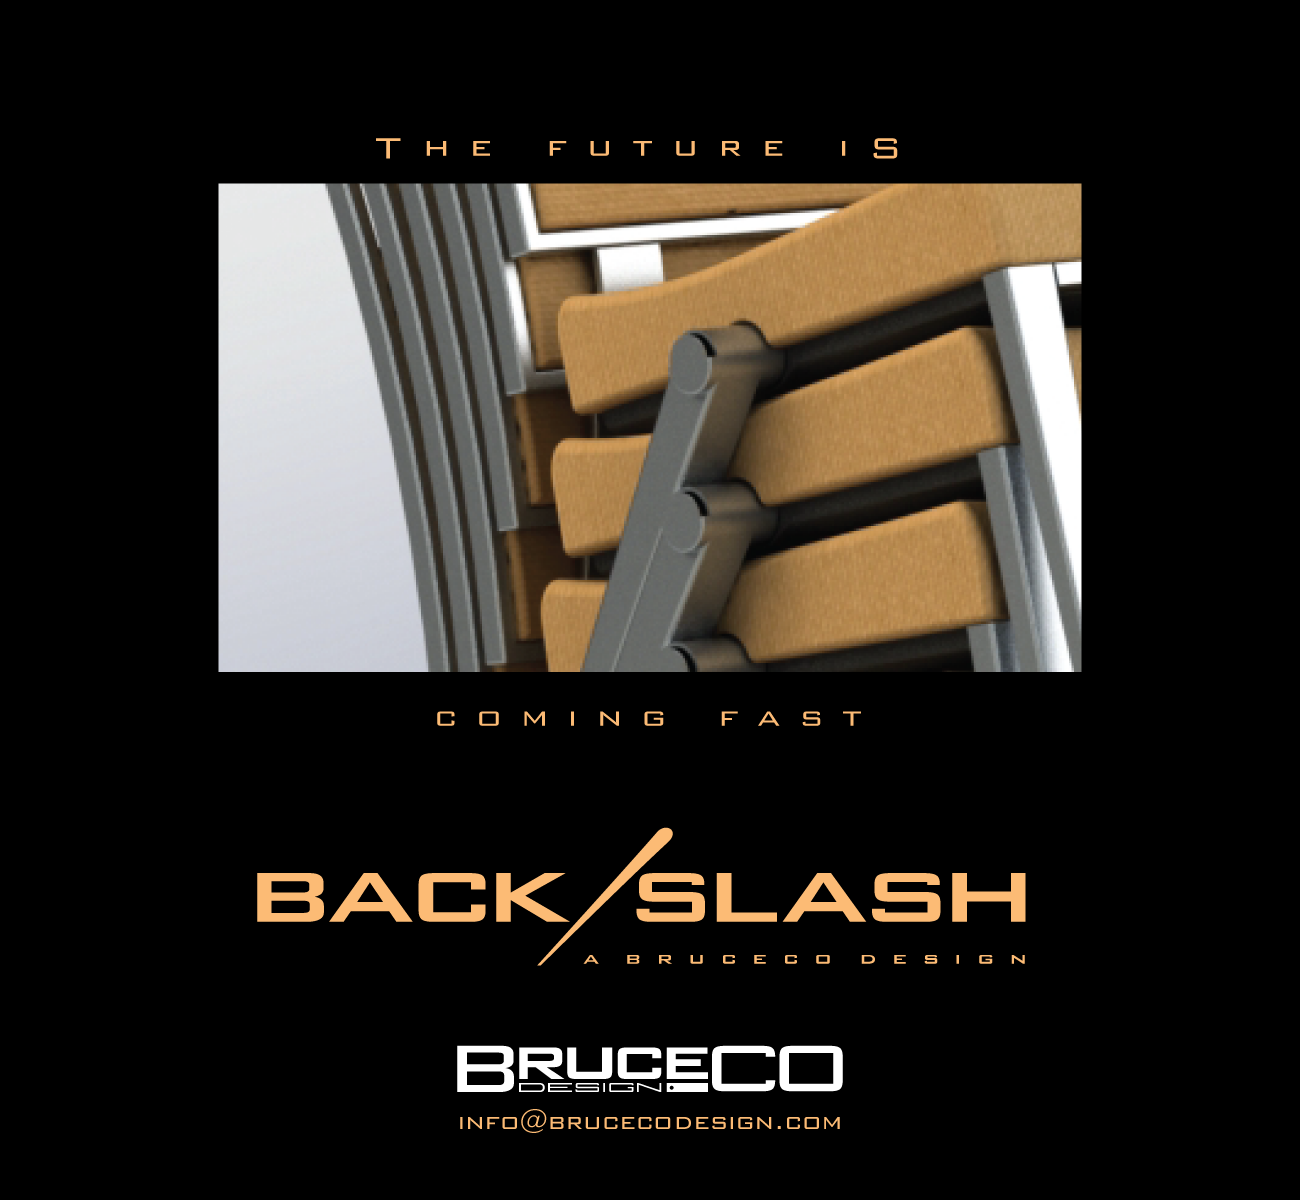 BruceCO Design Introduces BACK/SLASH - BruceCO DESIGN